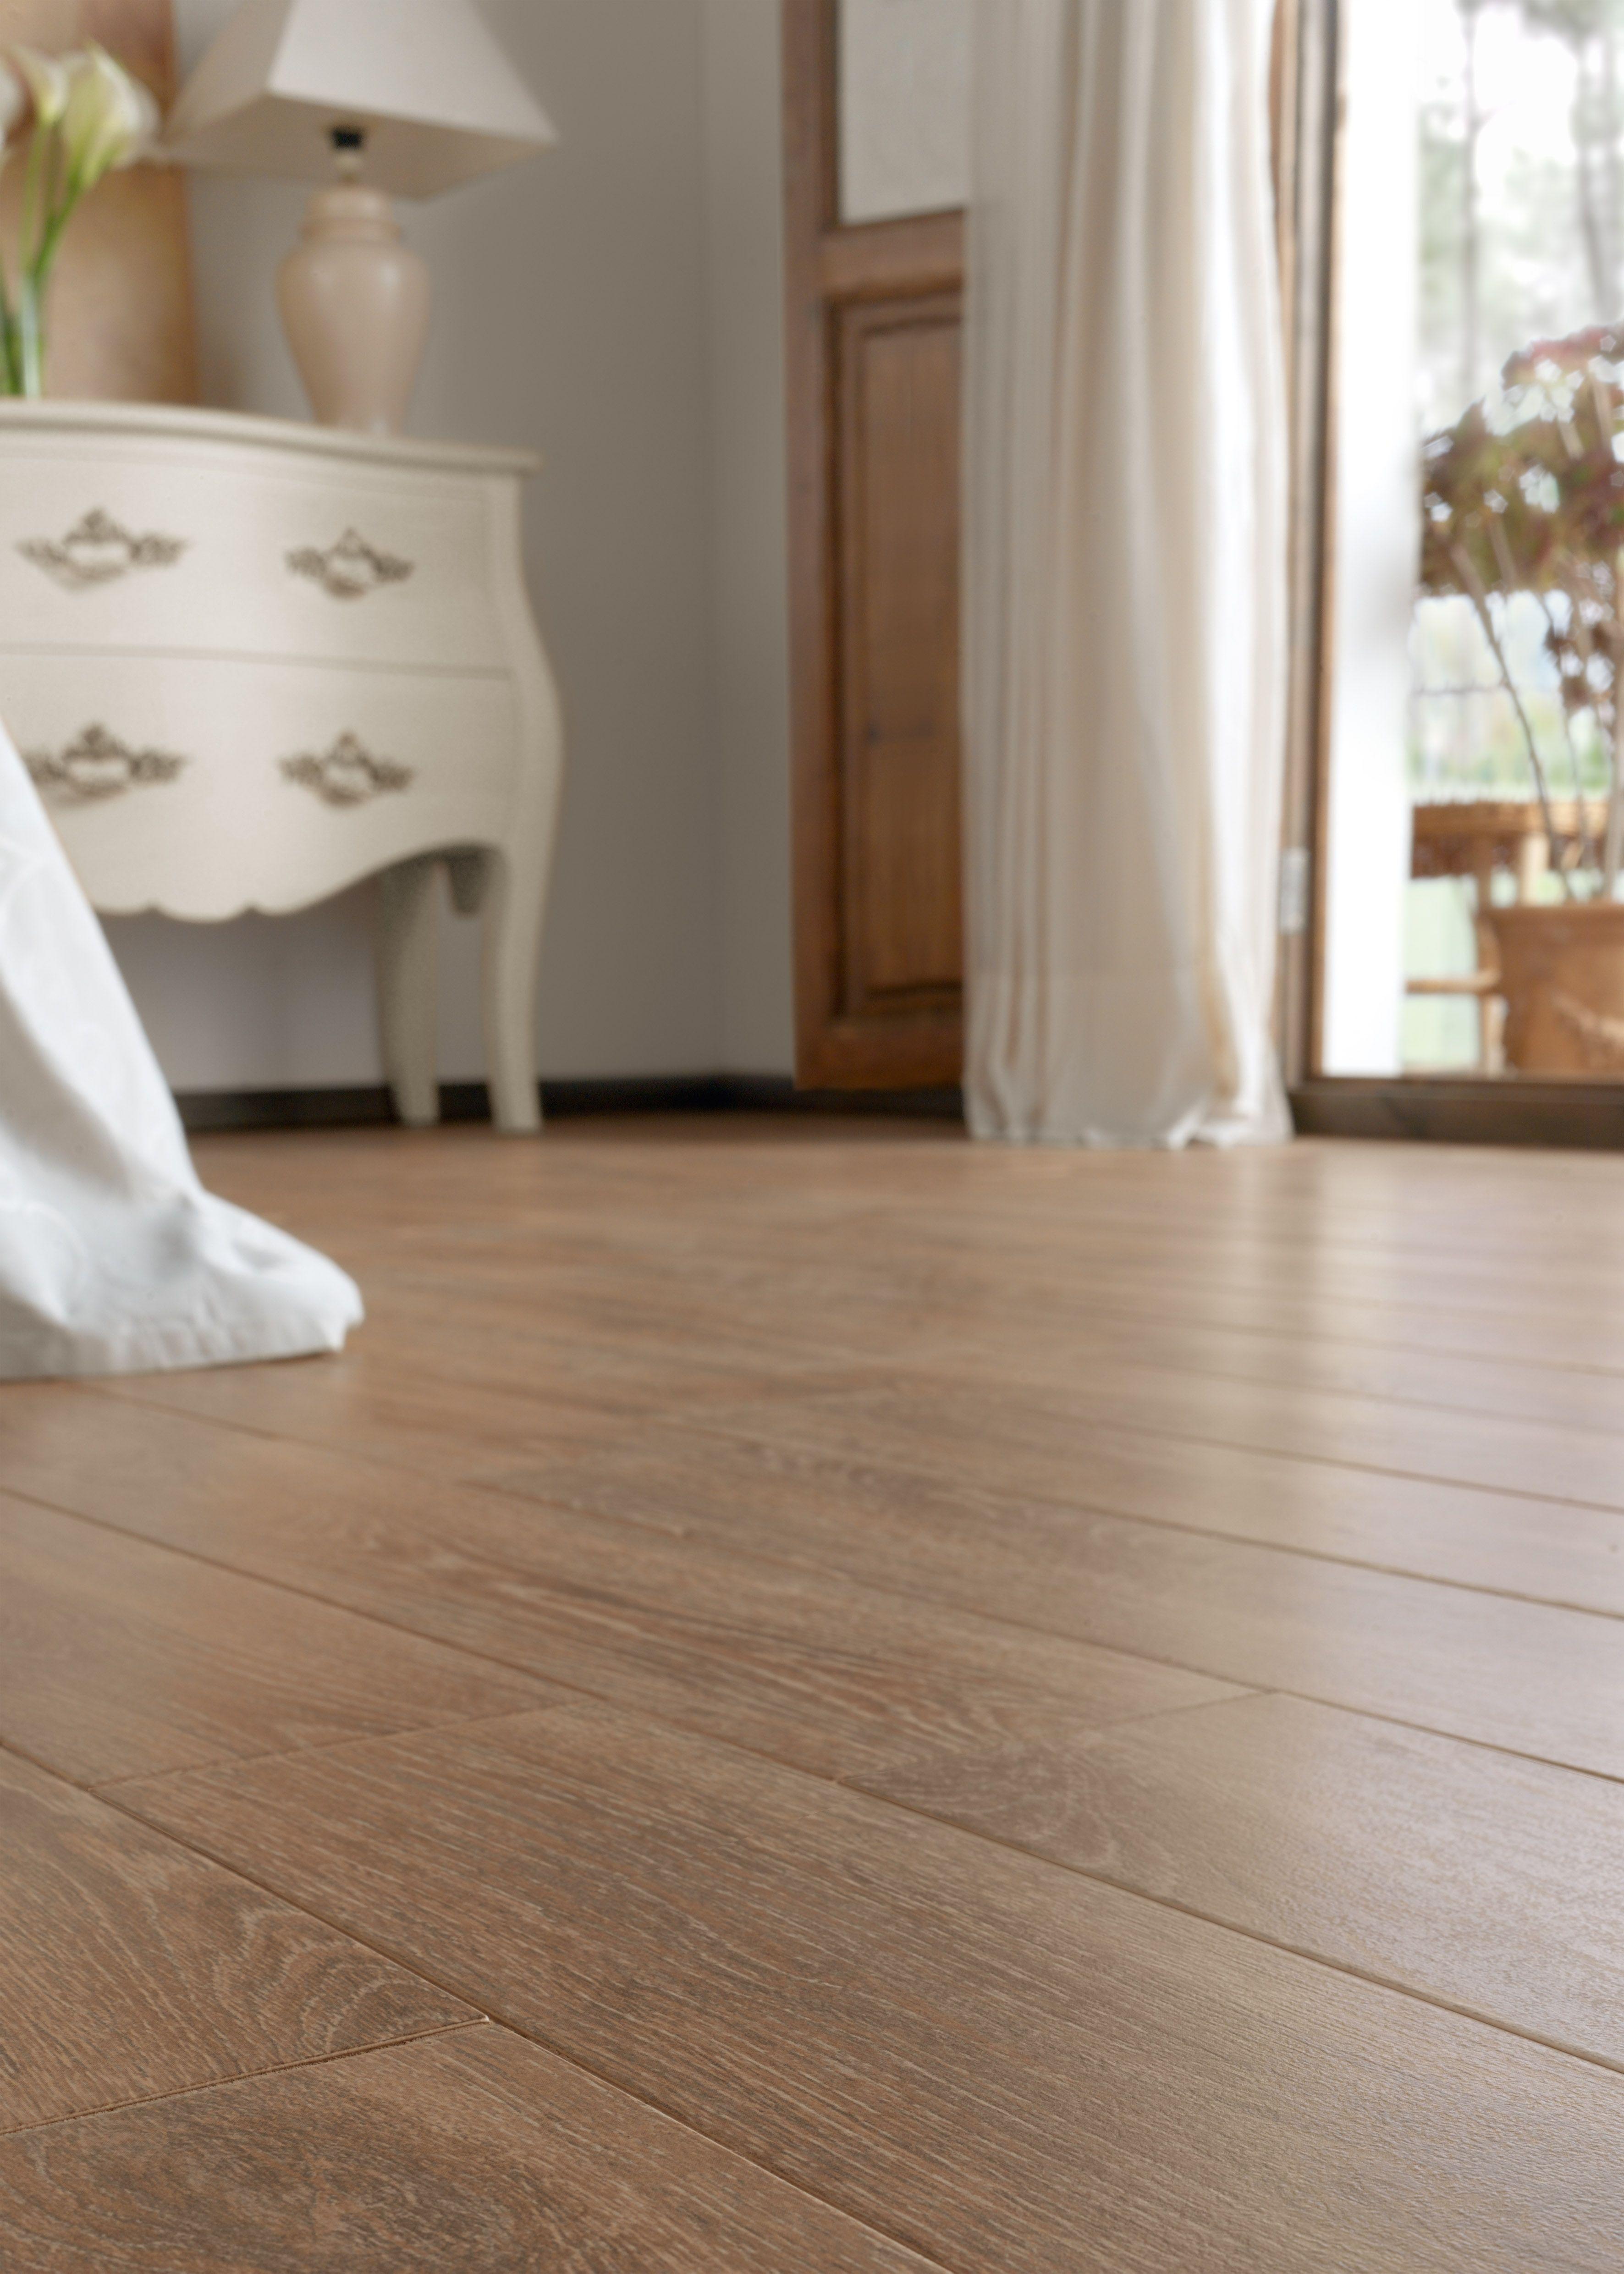 Non Slip Oak Wood Effect Porcelain Tiles 15x60cm Wood Effect Porcelain Tiles Master Bedroom Flooring Ideas Floor Tile Design